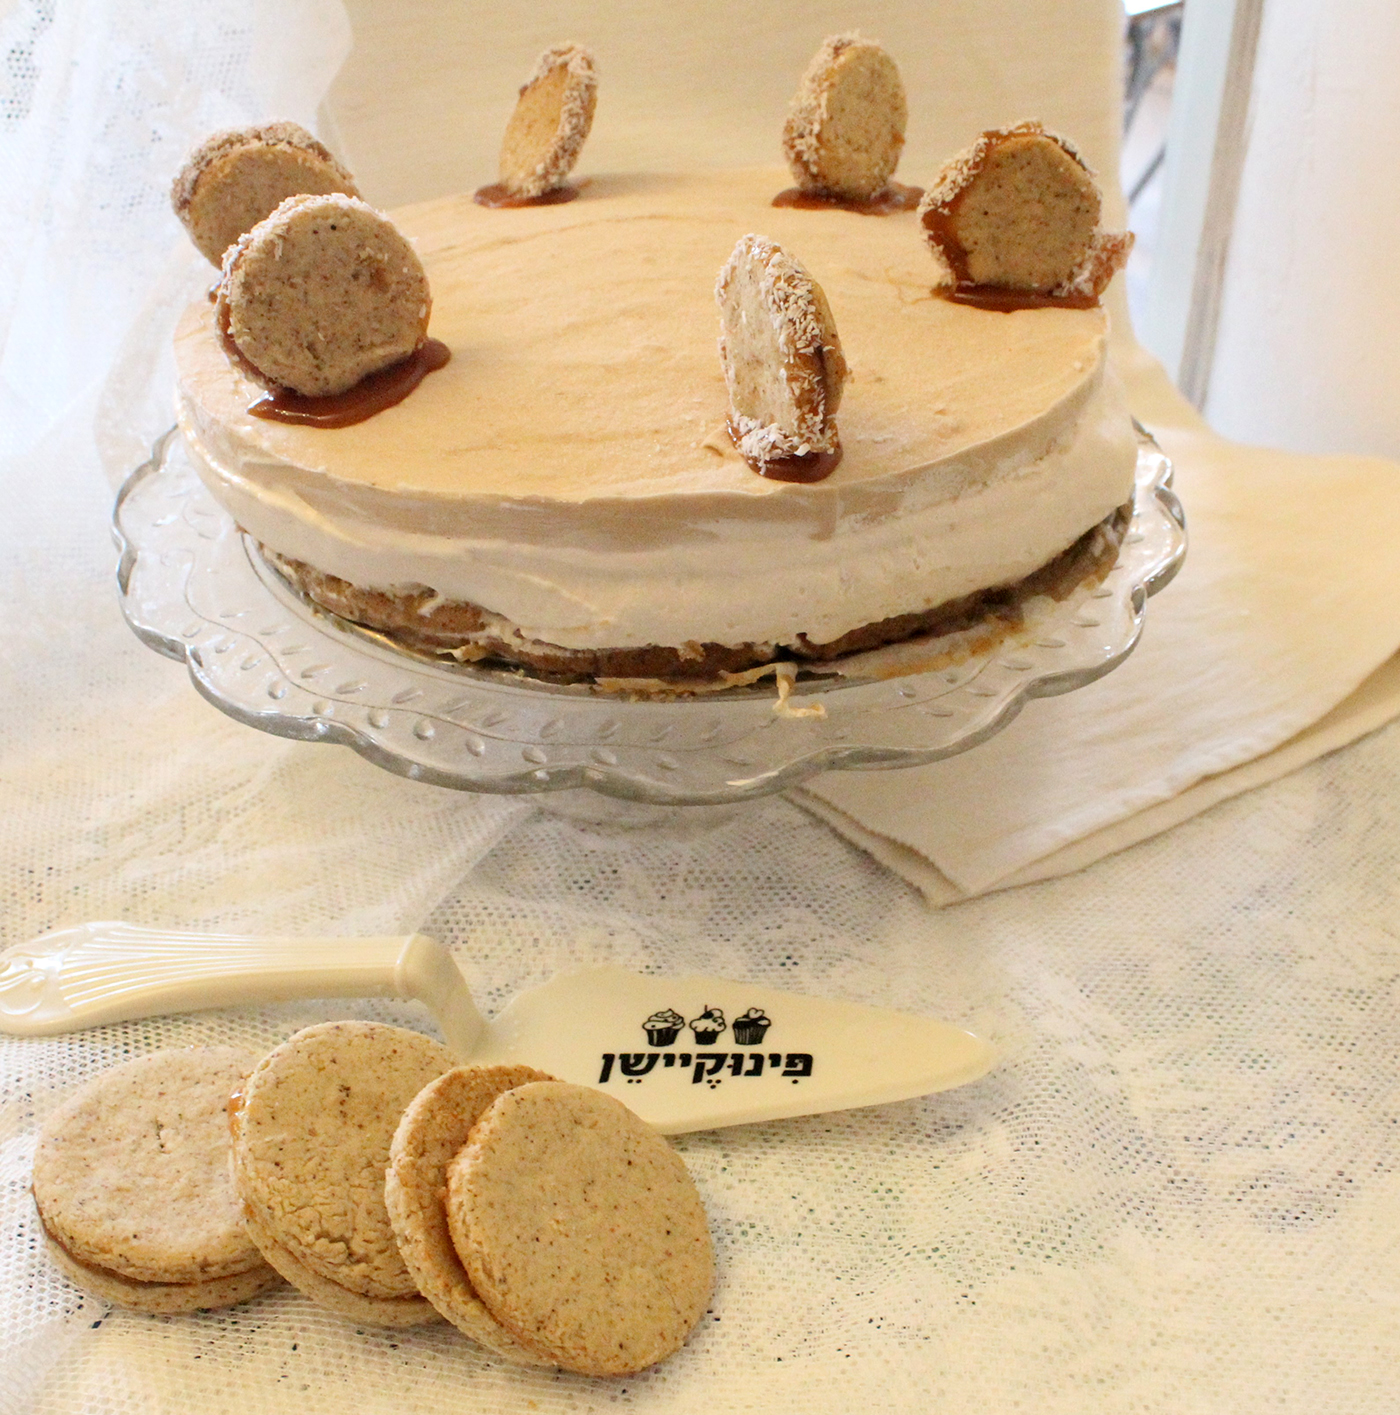 IMG 7773 - עוגת מוס על בסיס אלפחורס